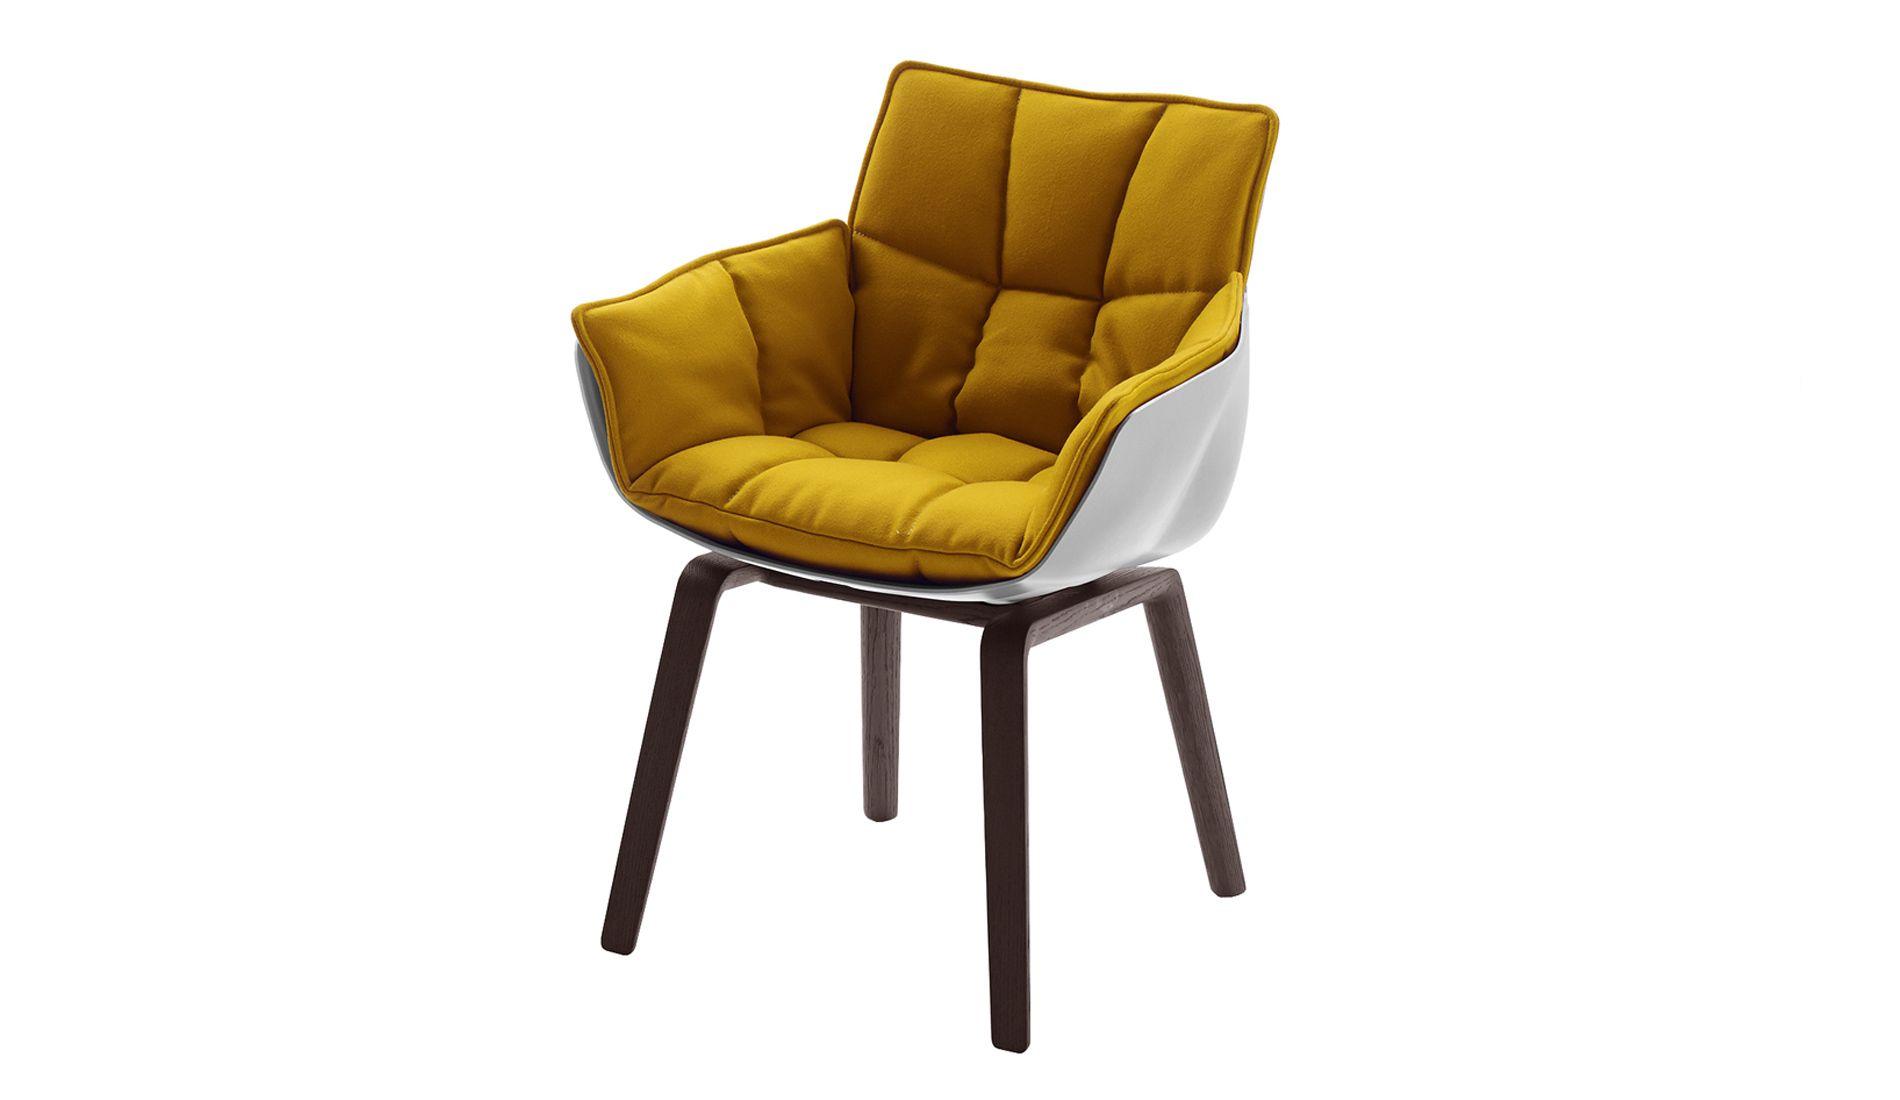 B B Italia Husk Chair With Wooden Base Small Armchair B B Italia Rocking Chair Makeover